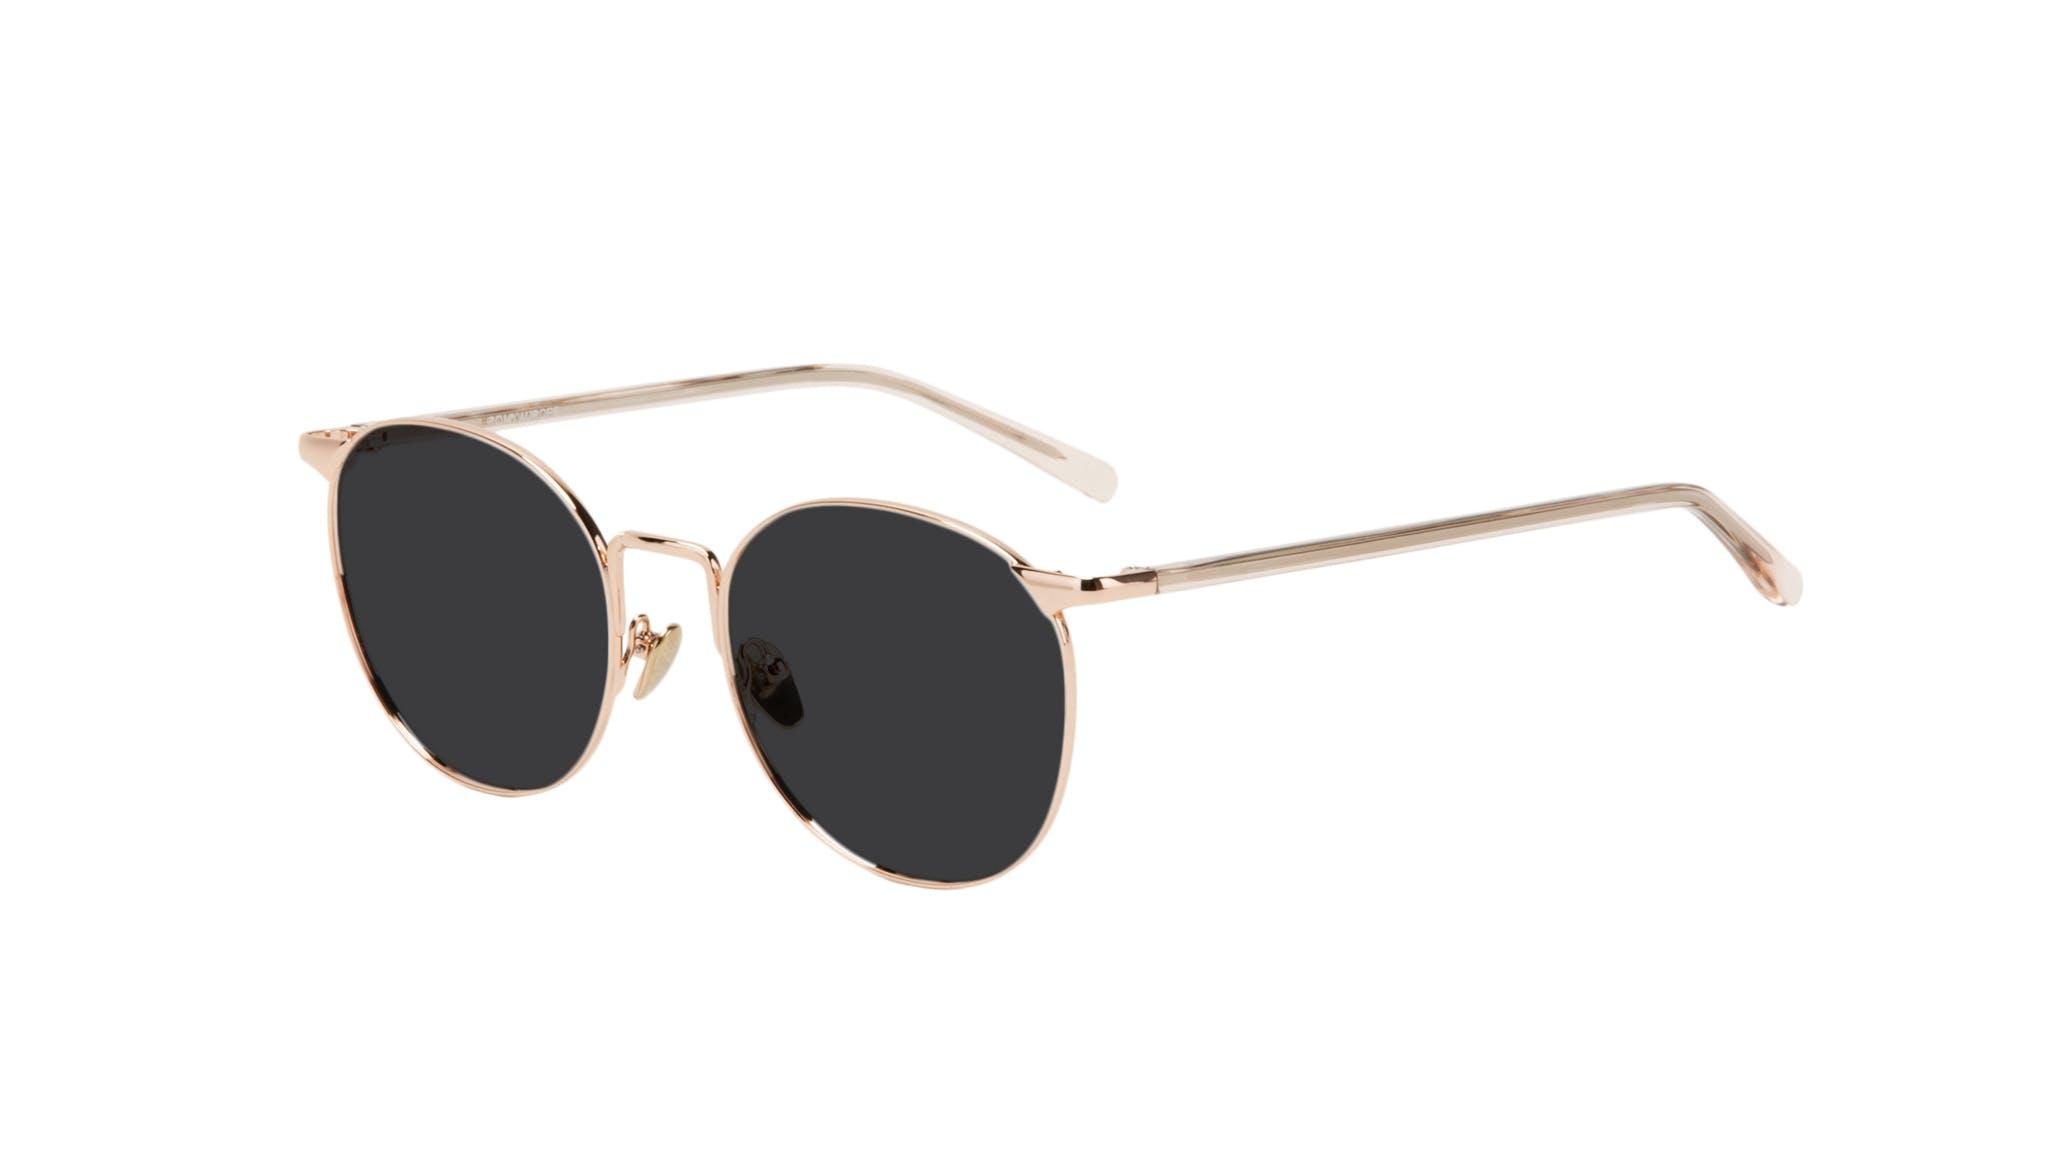 Affordable Fashion Glasses Round Sunglasses Women Romy Aurore Tilt